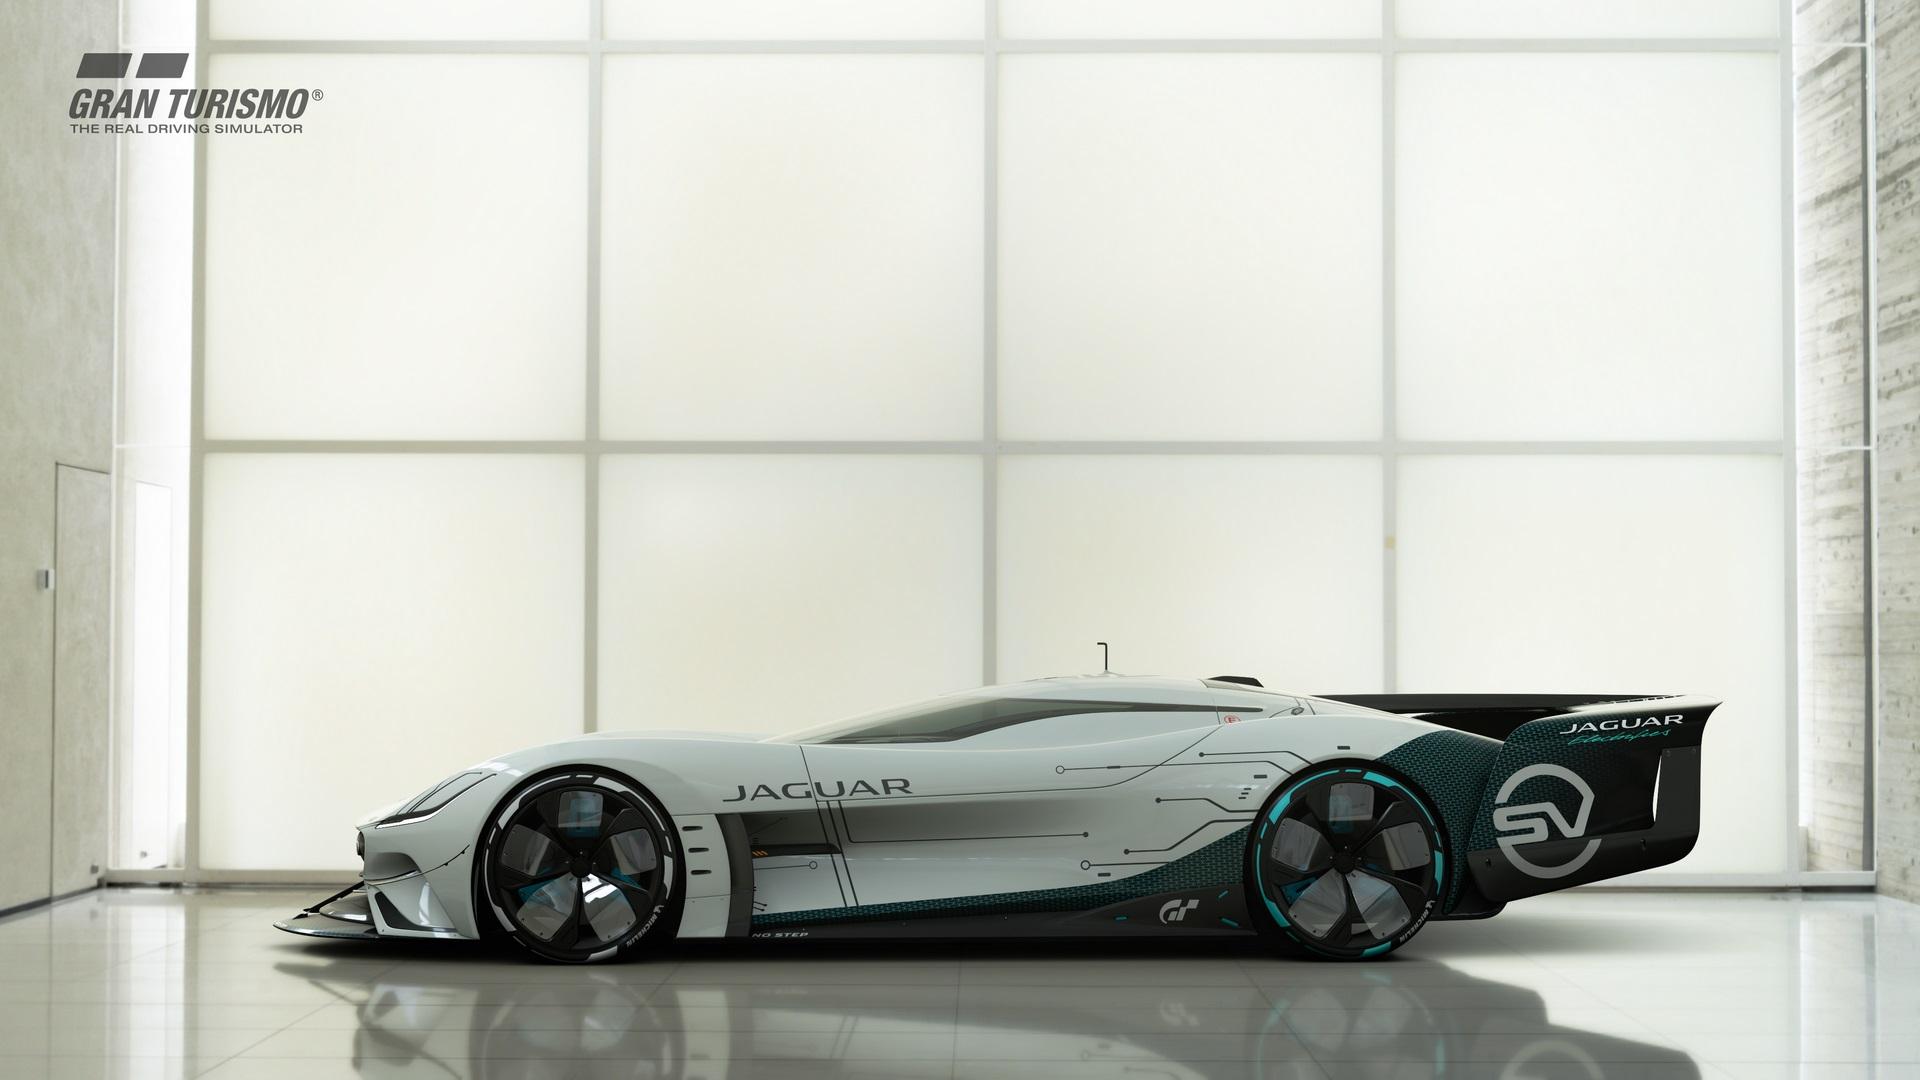 Jaguar-Vision-Gran-Turismo-SV-6